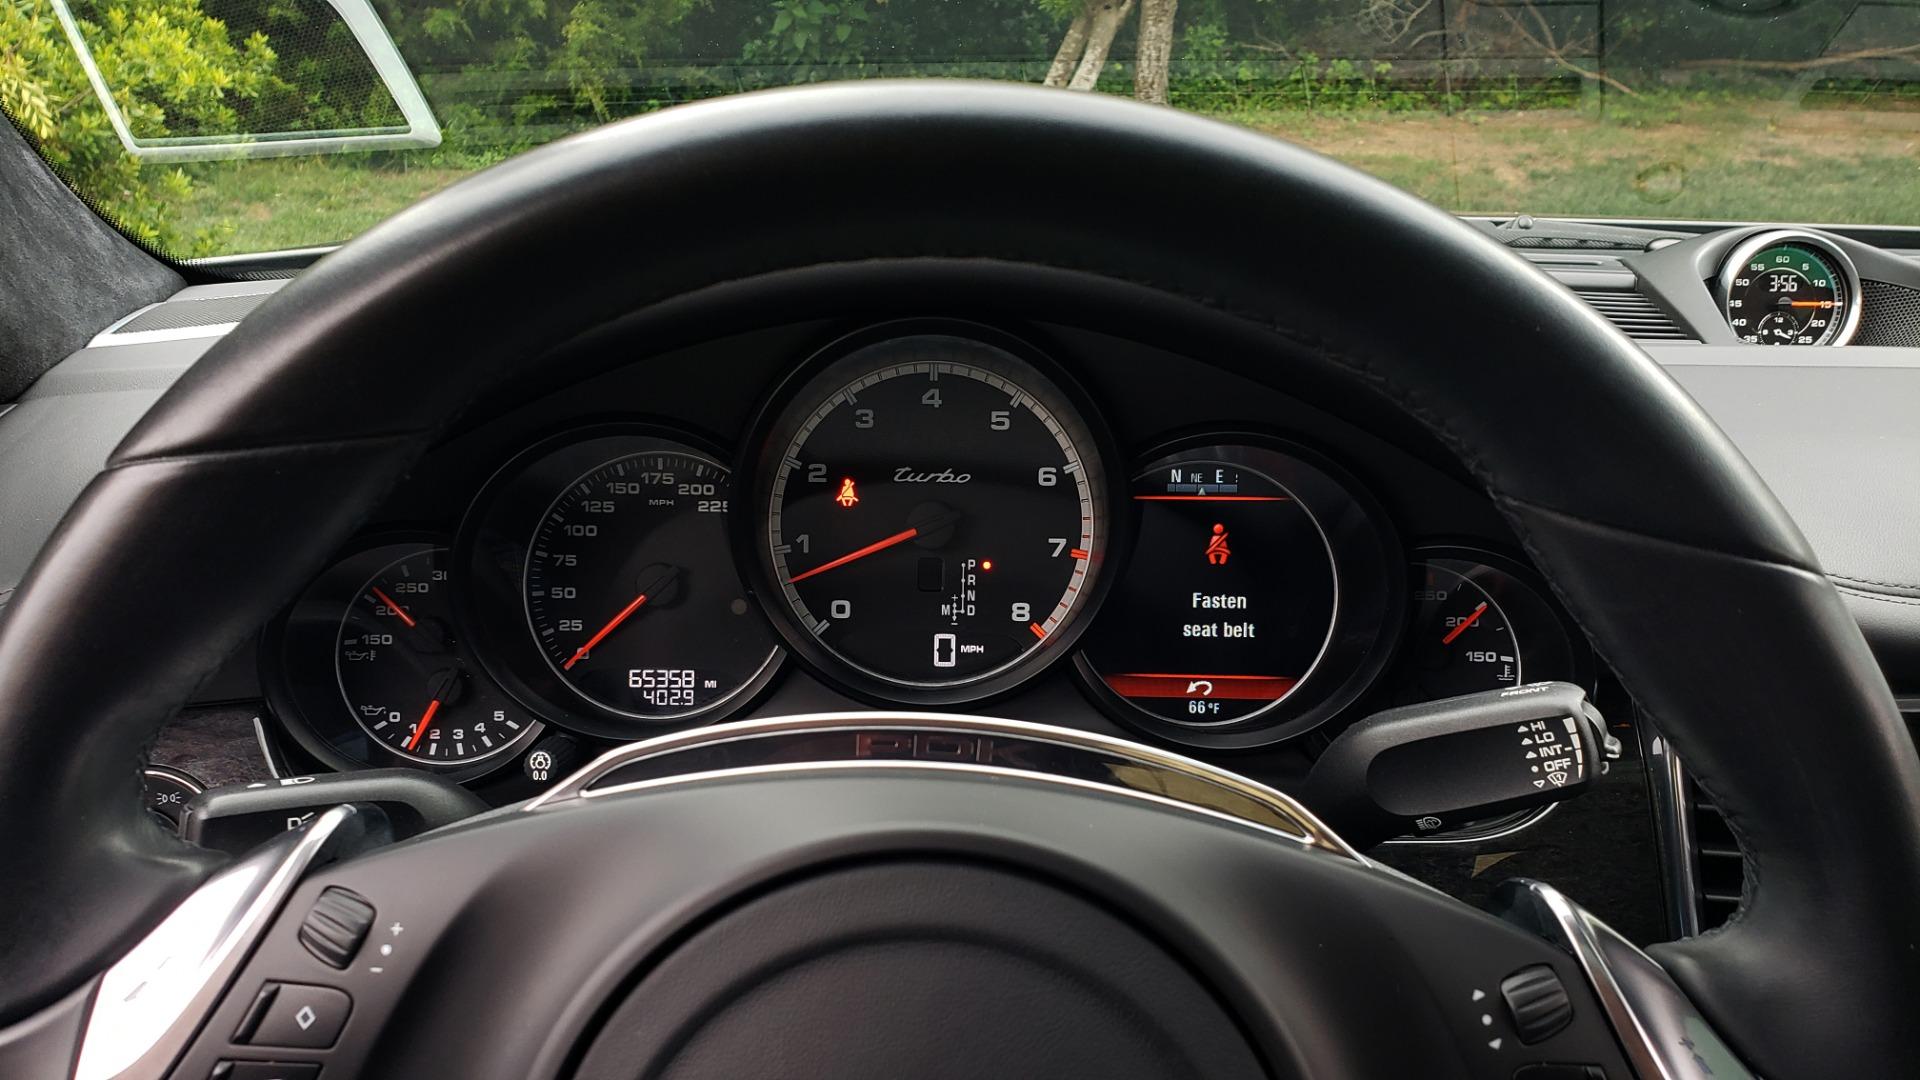 Used 2013 Porsche PANAMERA TURBO 4.8L V8 / AWD / NAV / SUNROOF / LCA / PARK ASST / BURMESTER for sale $45,995 at Formula Imports in Charlotte NC 28227 43